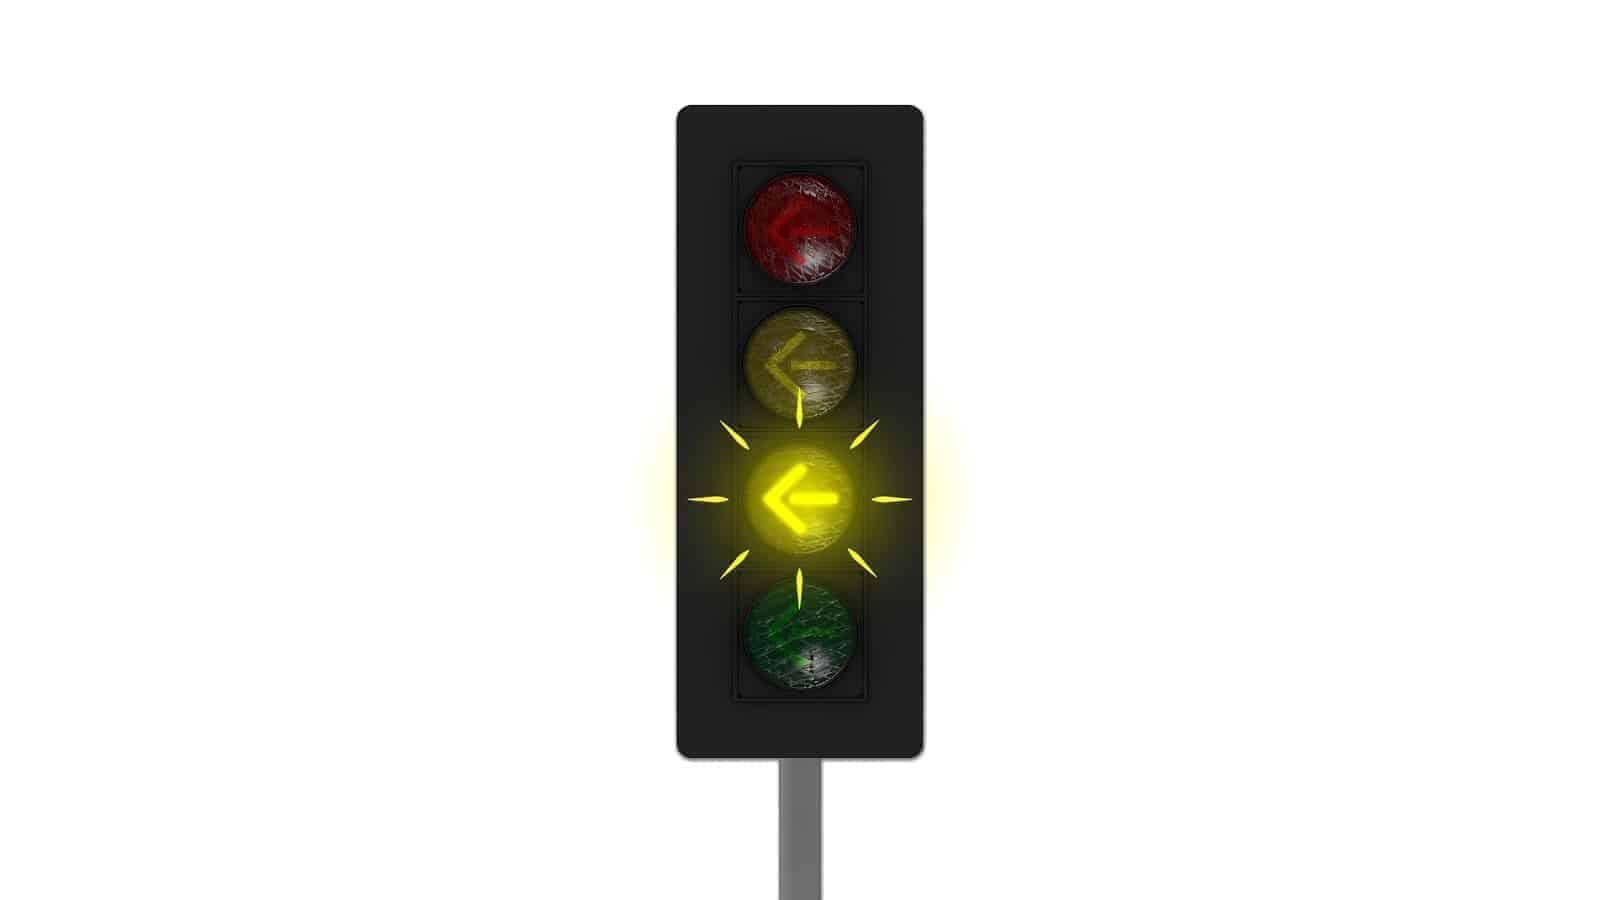 Flashing yellow traffic light arrow